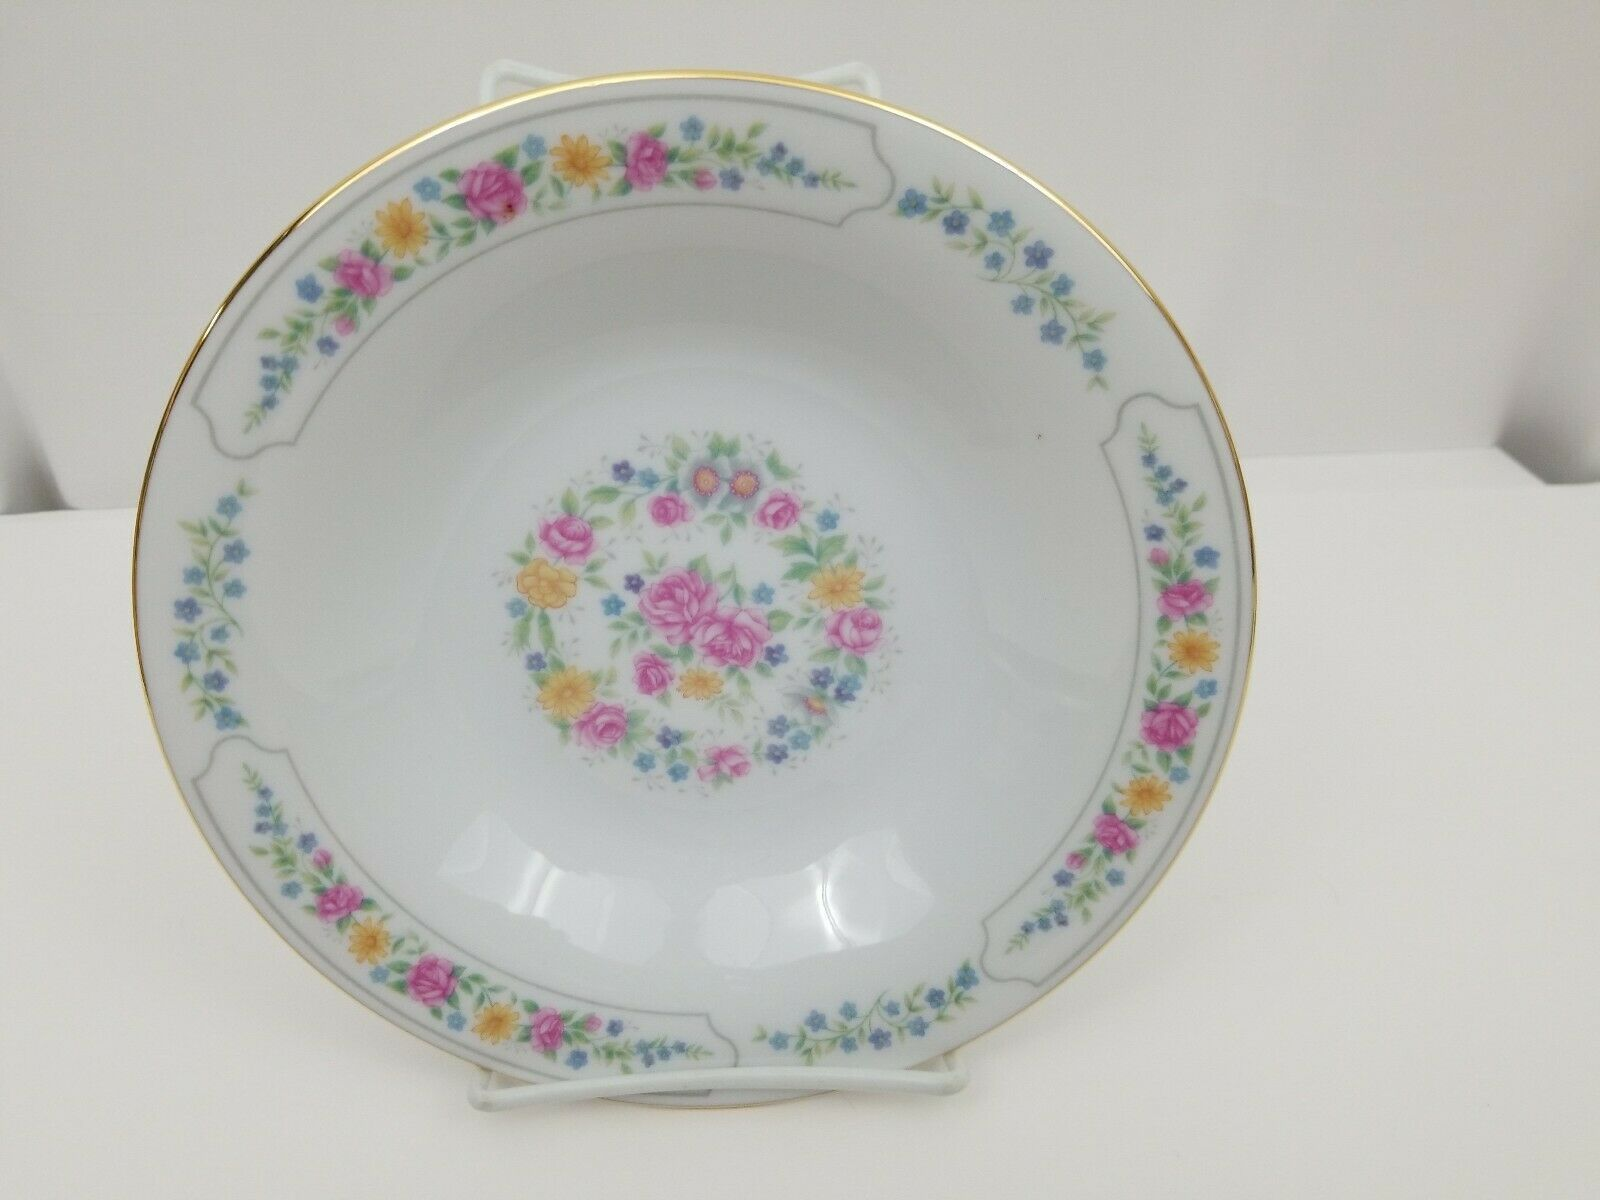 Liling Fine China Cereal Soup Bowls Set of 4 Yung Shen White Roses Keepsake 8.25 image 5